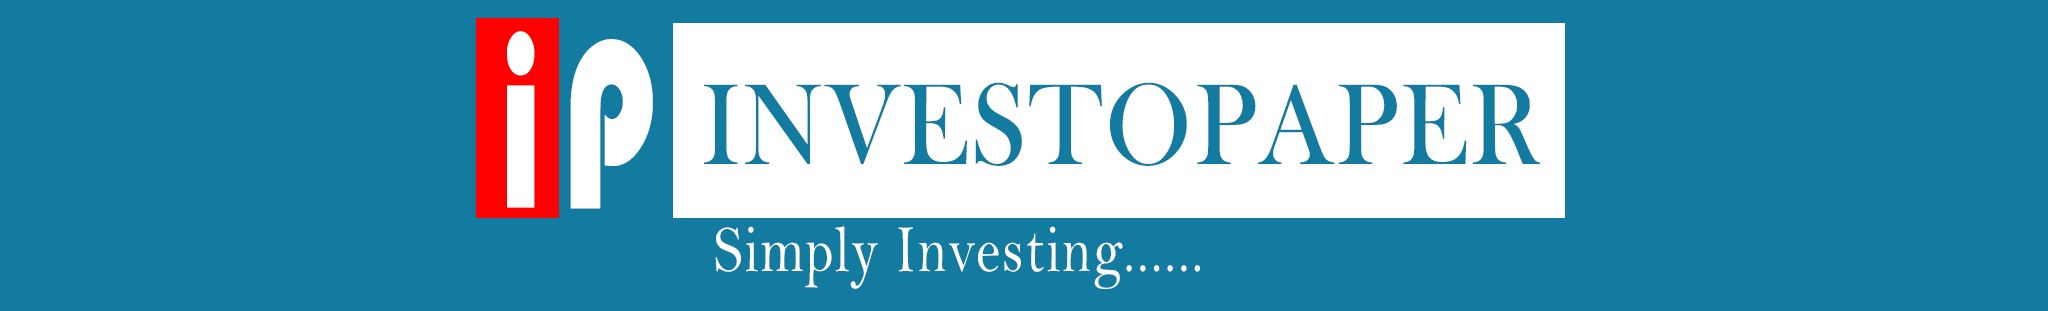 Investopaper